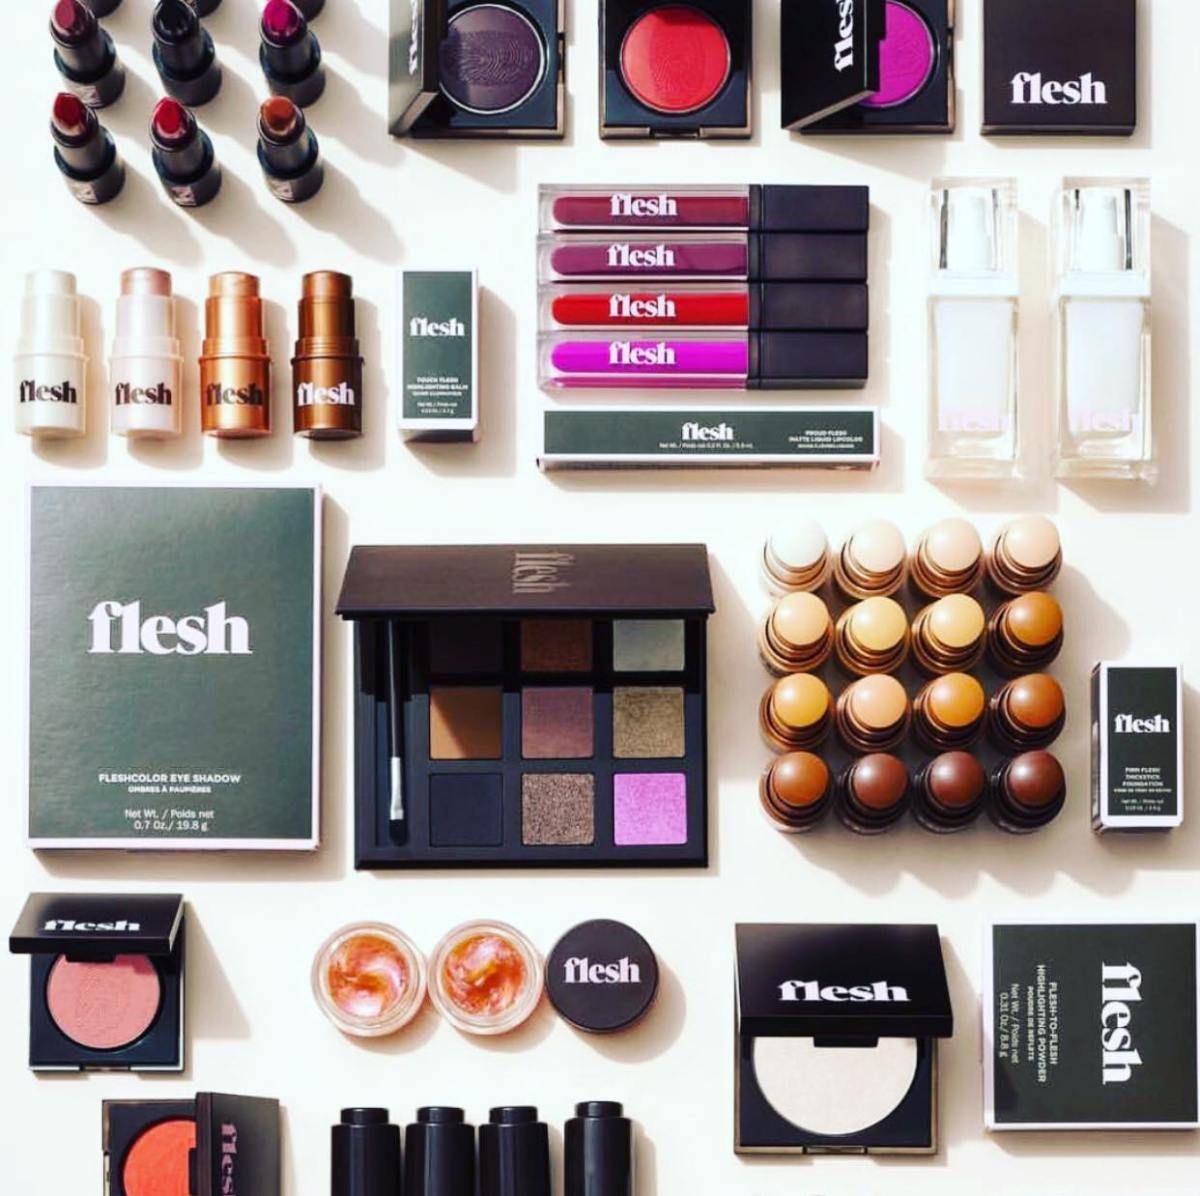 Is Ulta's Newest Brand Flesh Cosmetics CrueltyFree